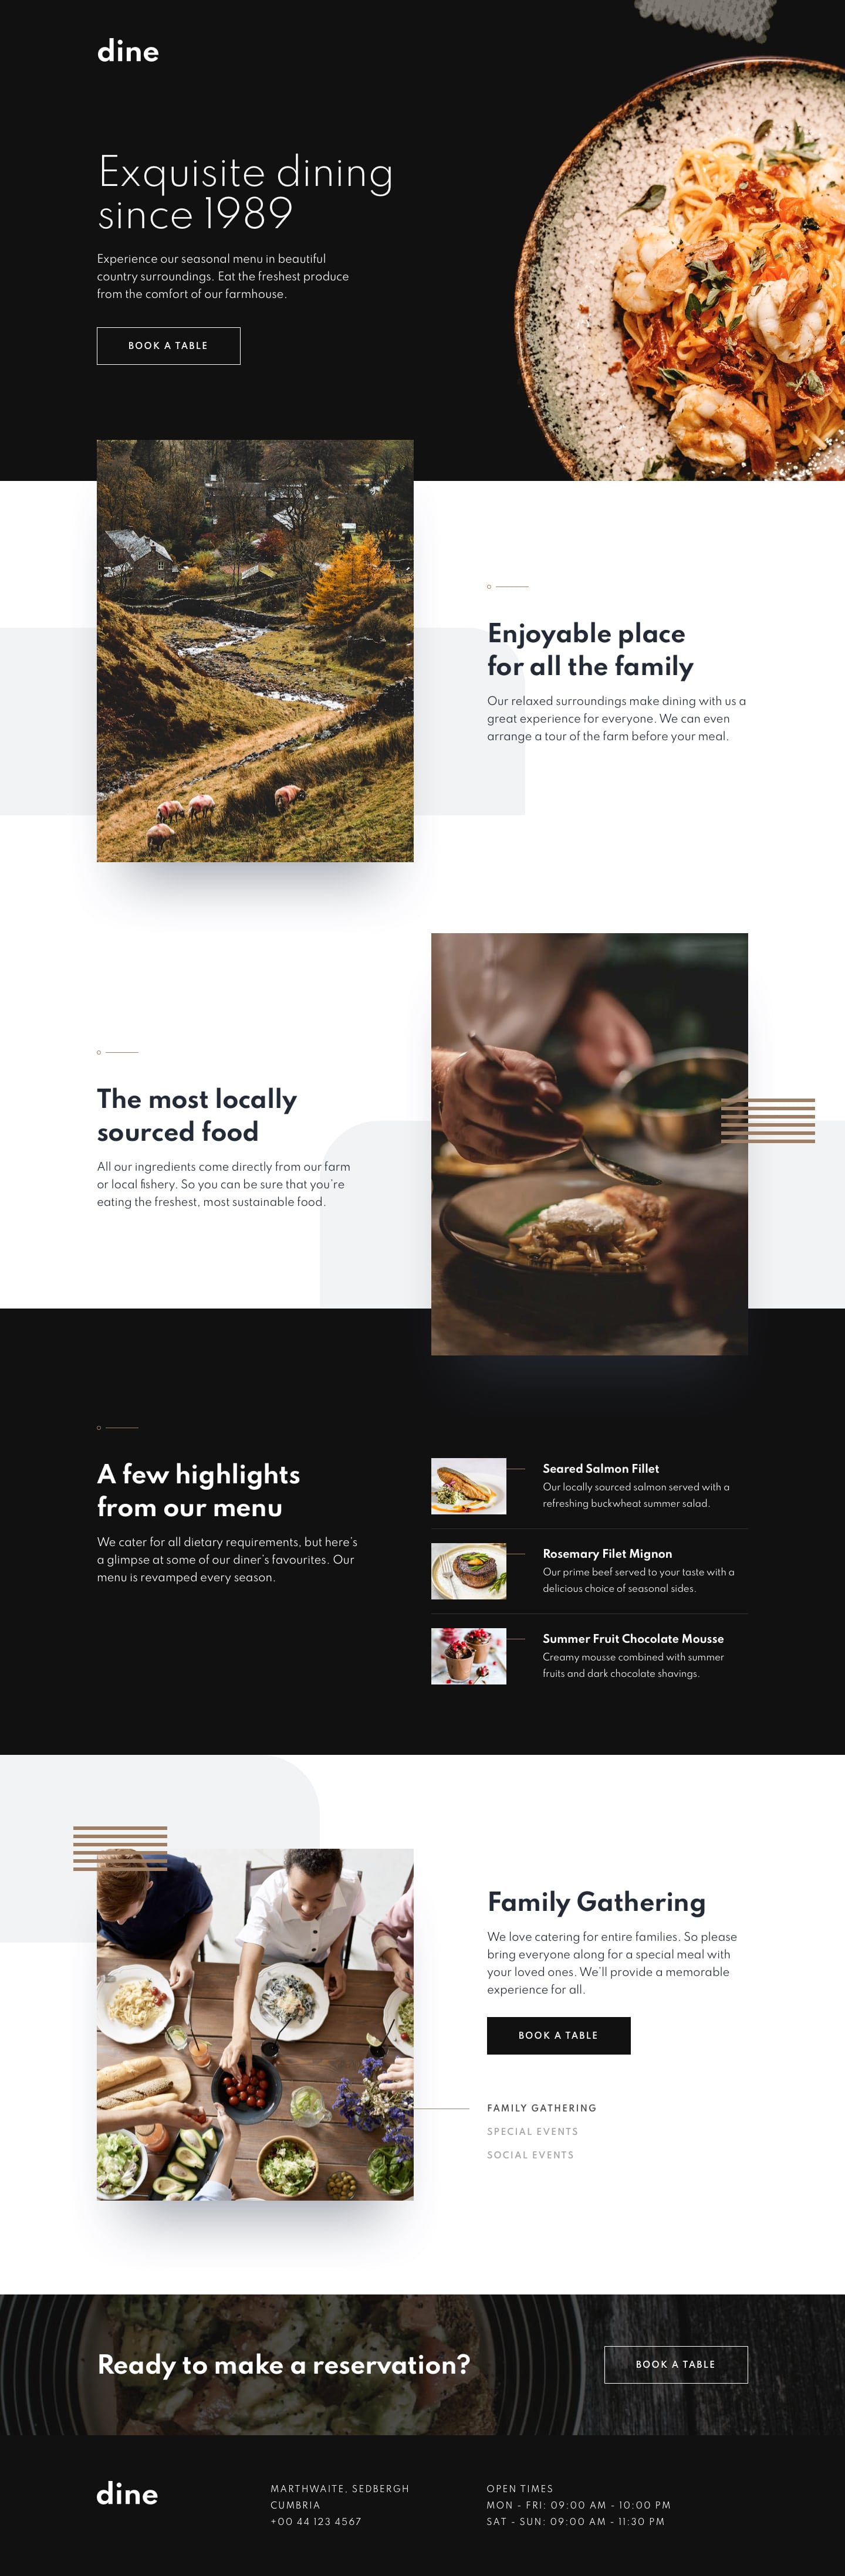 Design preview for Dine restaurant website coding challenge